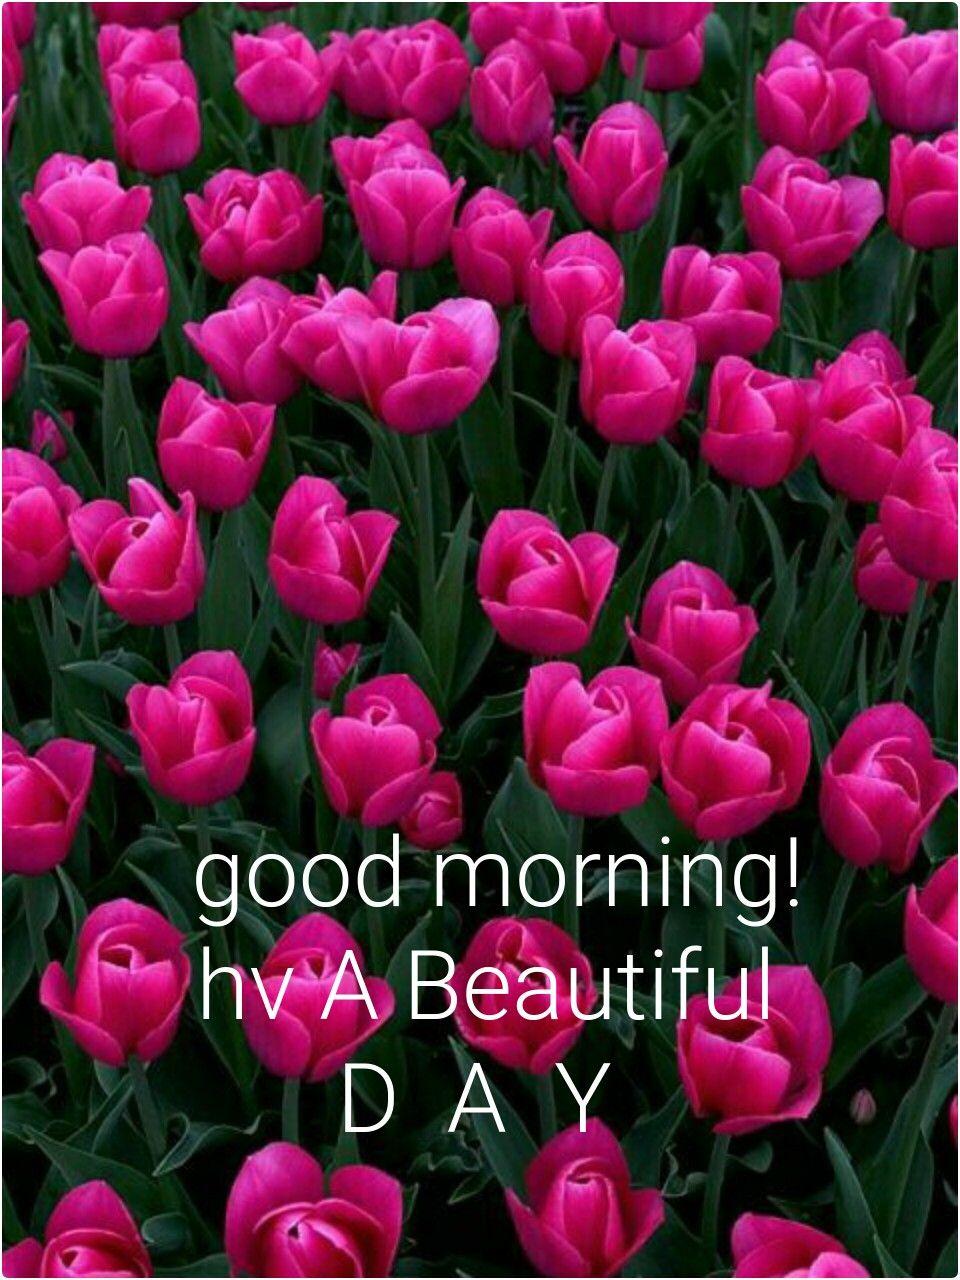 Good Morning Good Morning Good Morning Morning Greeting